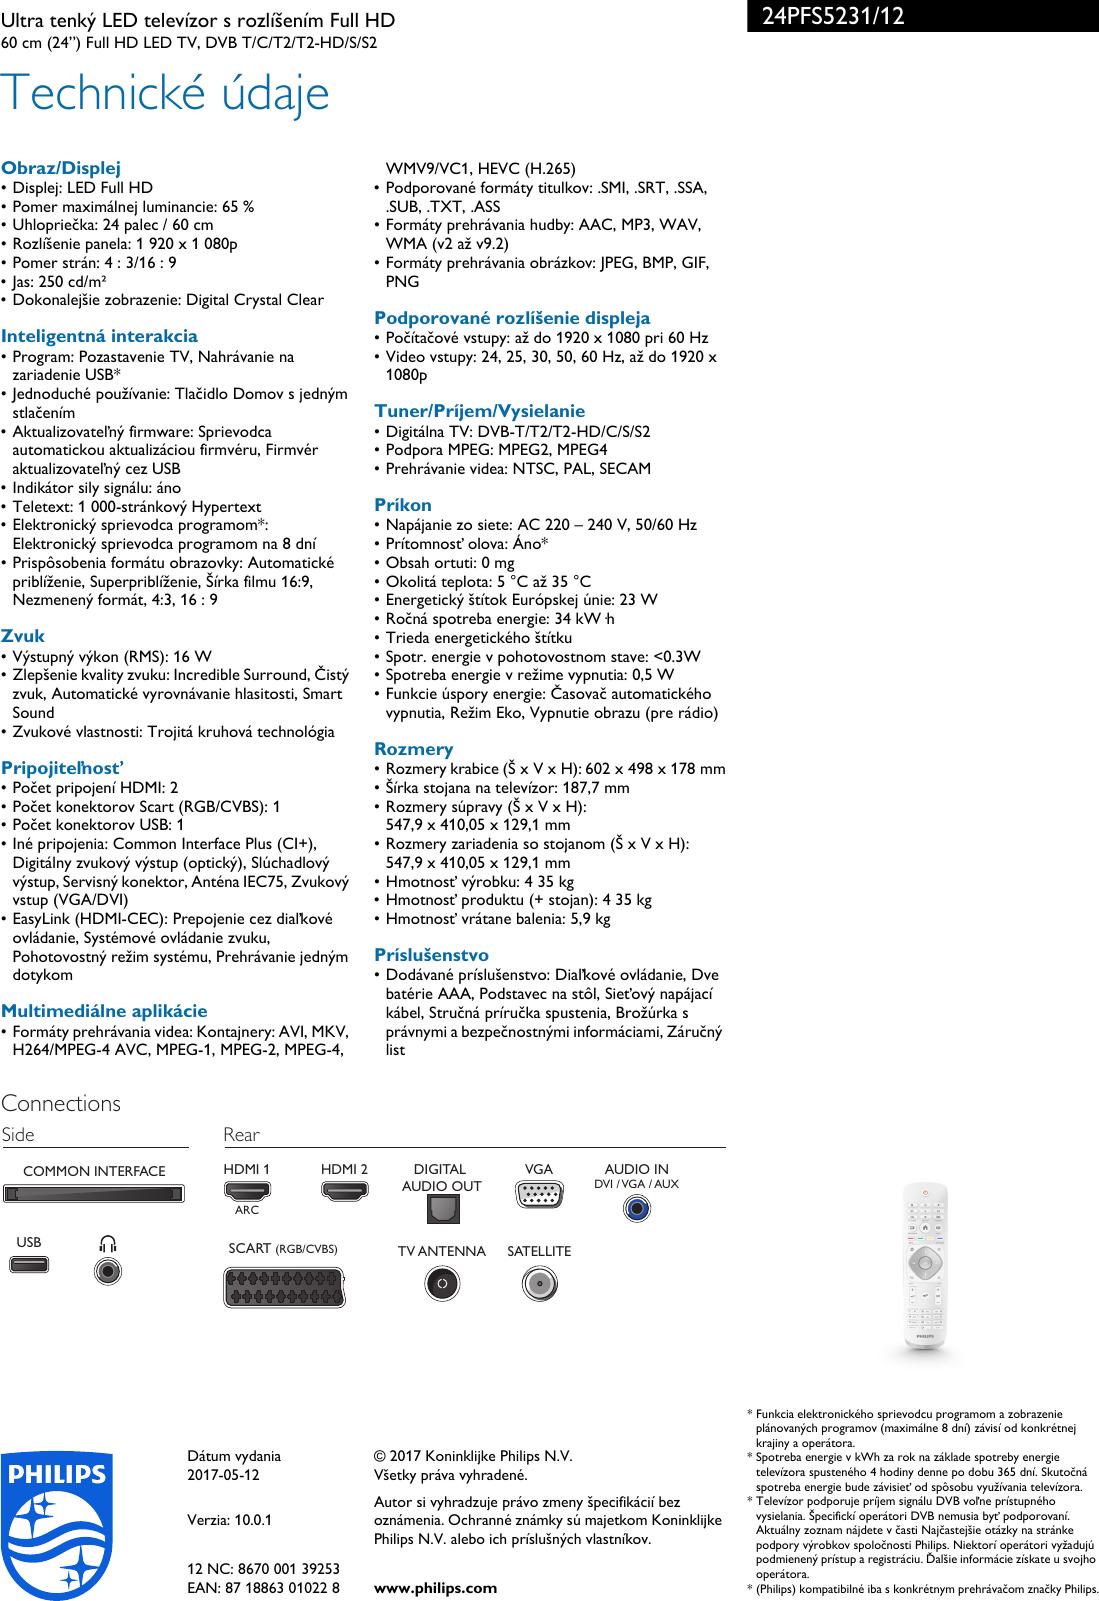 29cc3259a Page 3 of 3 - Philips 24PFS5231/12 Leaflet 24PFS5231_12 Released Slovakia  (Slovak)